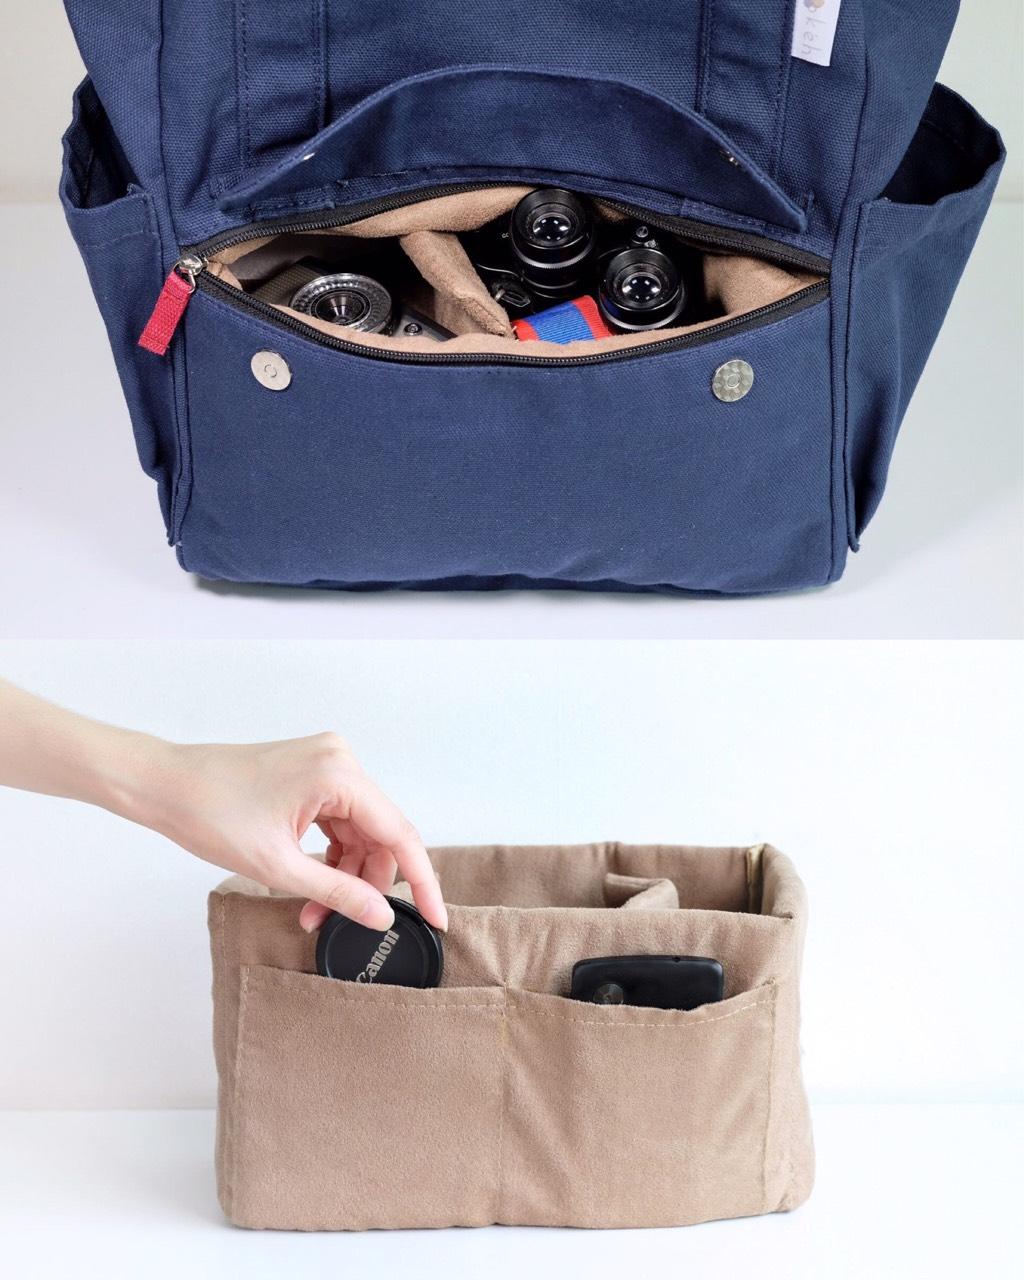 bokeh_camerabag,bokehbag,camerabag,Black,bag,camera,กล้อง,กระเป๋า,กระเป๋ากล้อง,Bokeh_Camerabag,Bokeh,bokehoutoffocus,ClassicBlack,bokeh,กระเป๋าเป้,กระเป๋าเดินทาง,กระเป๋าสะพาย,backpack,เป้